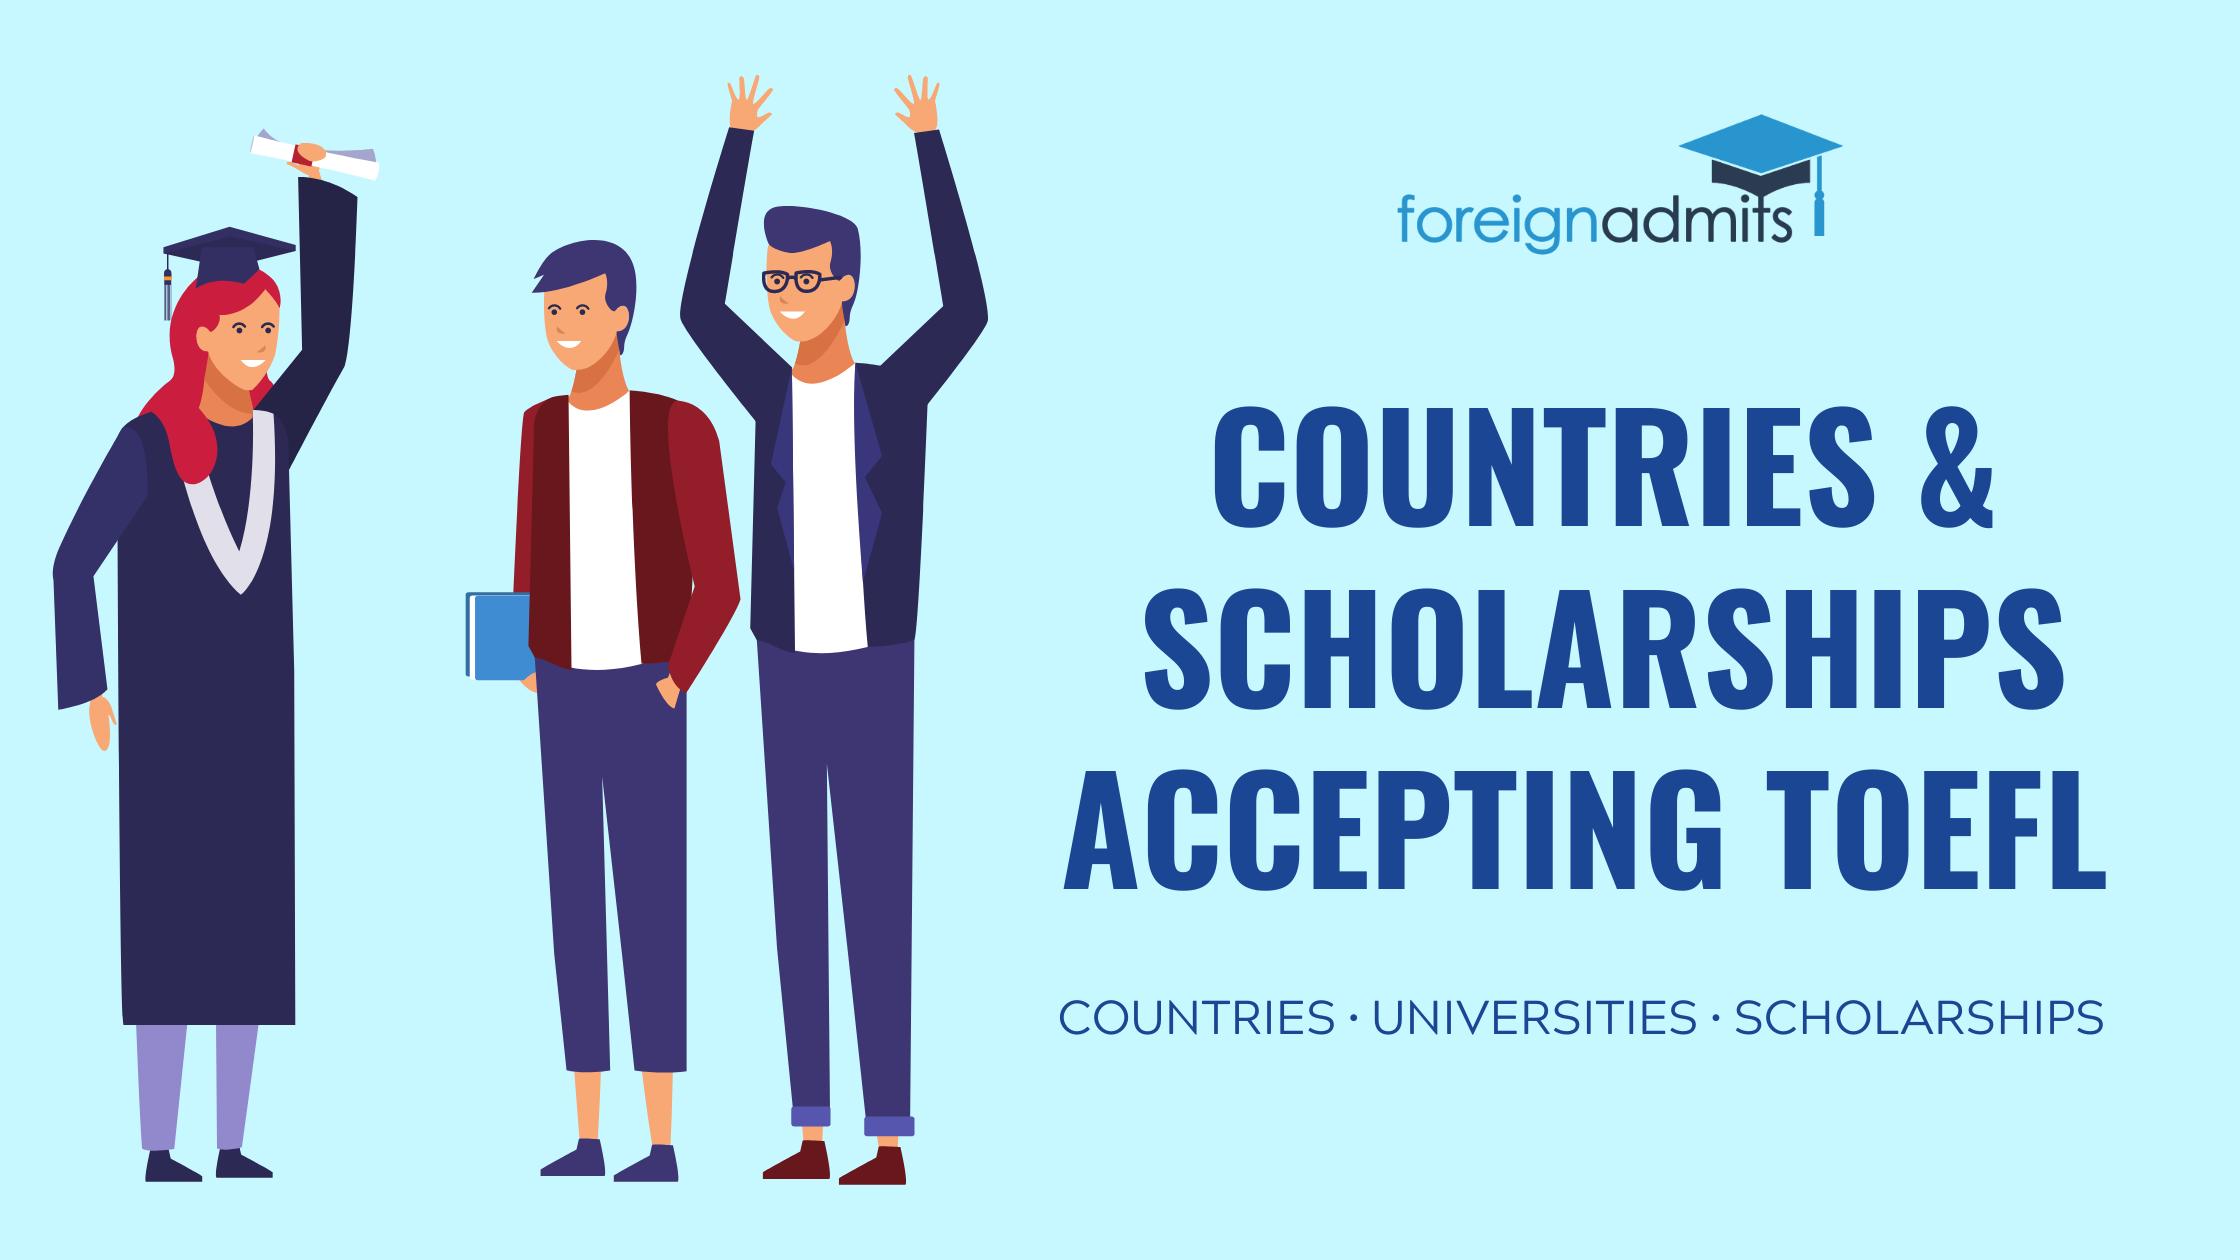 Countries accepting TOEFL score